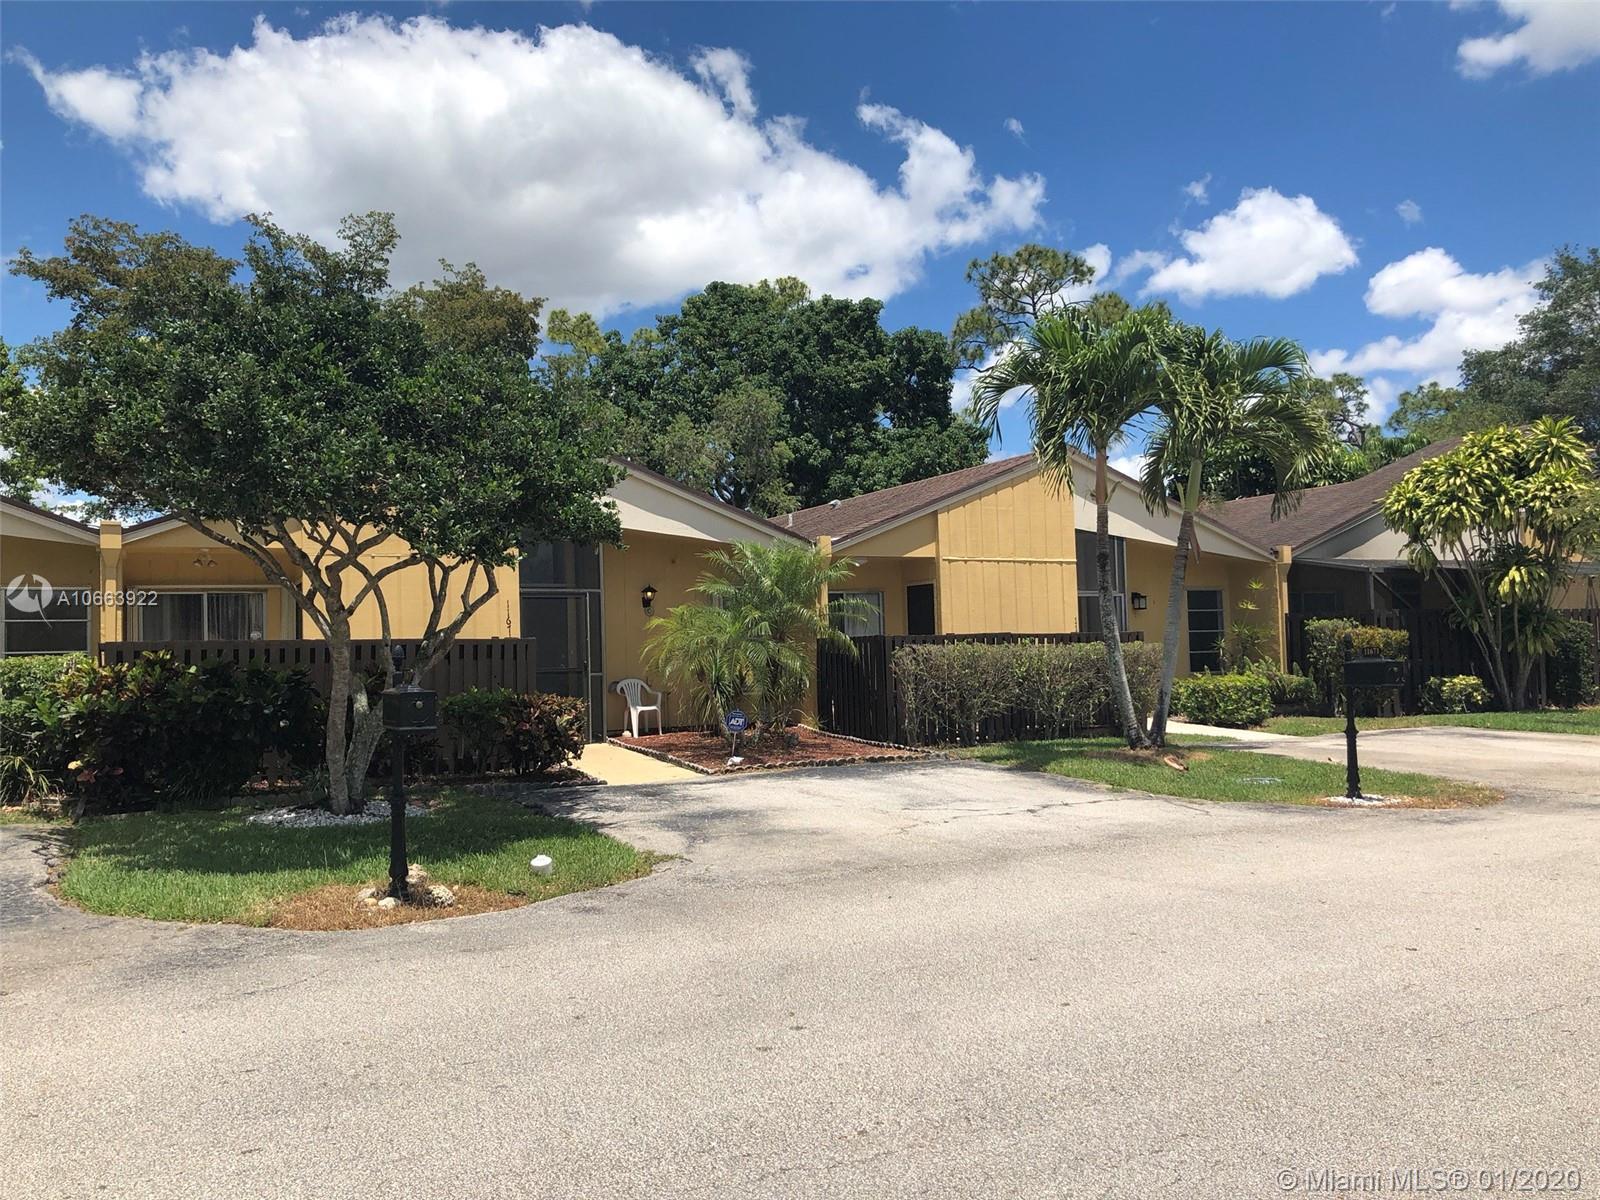 11671 Timbers Way, Boca Raton, FL 33428